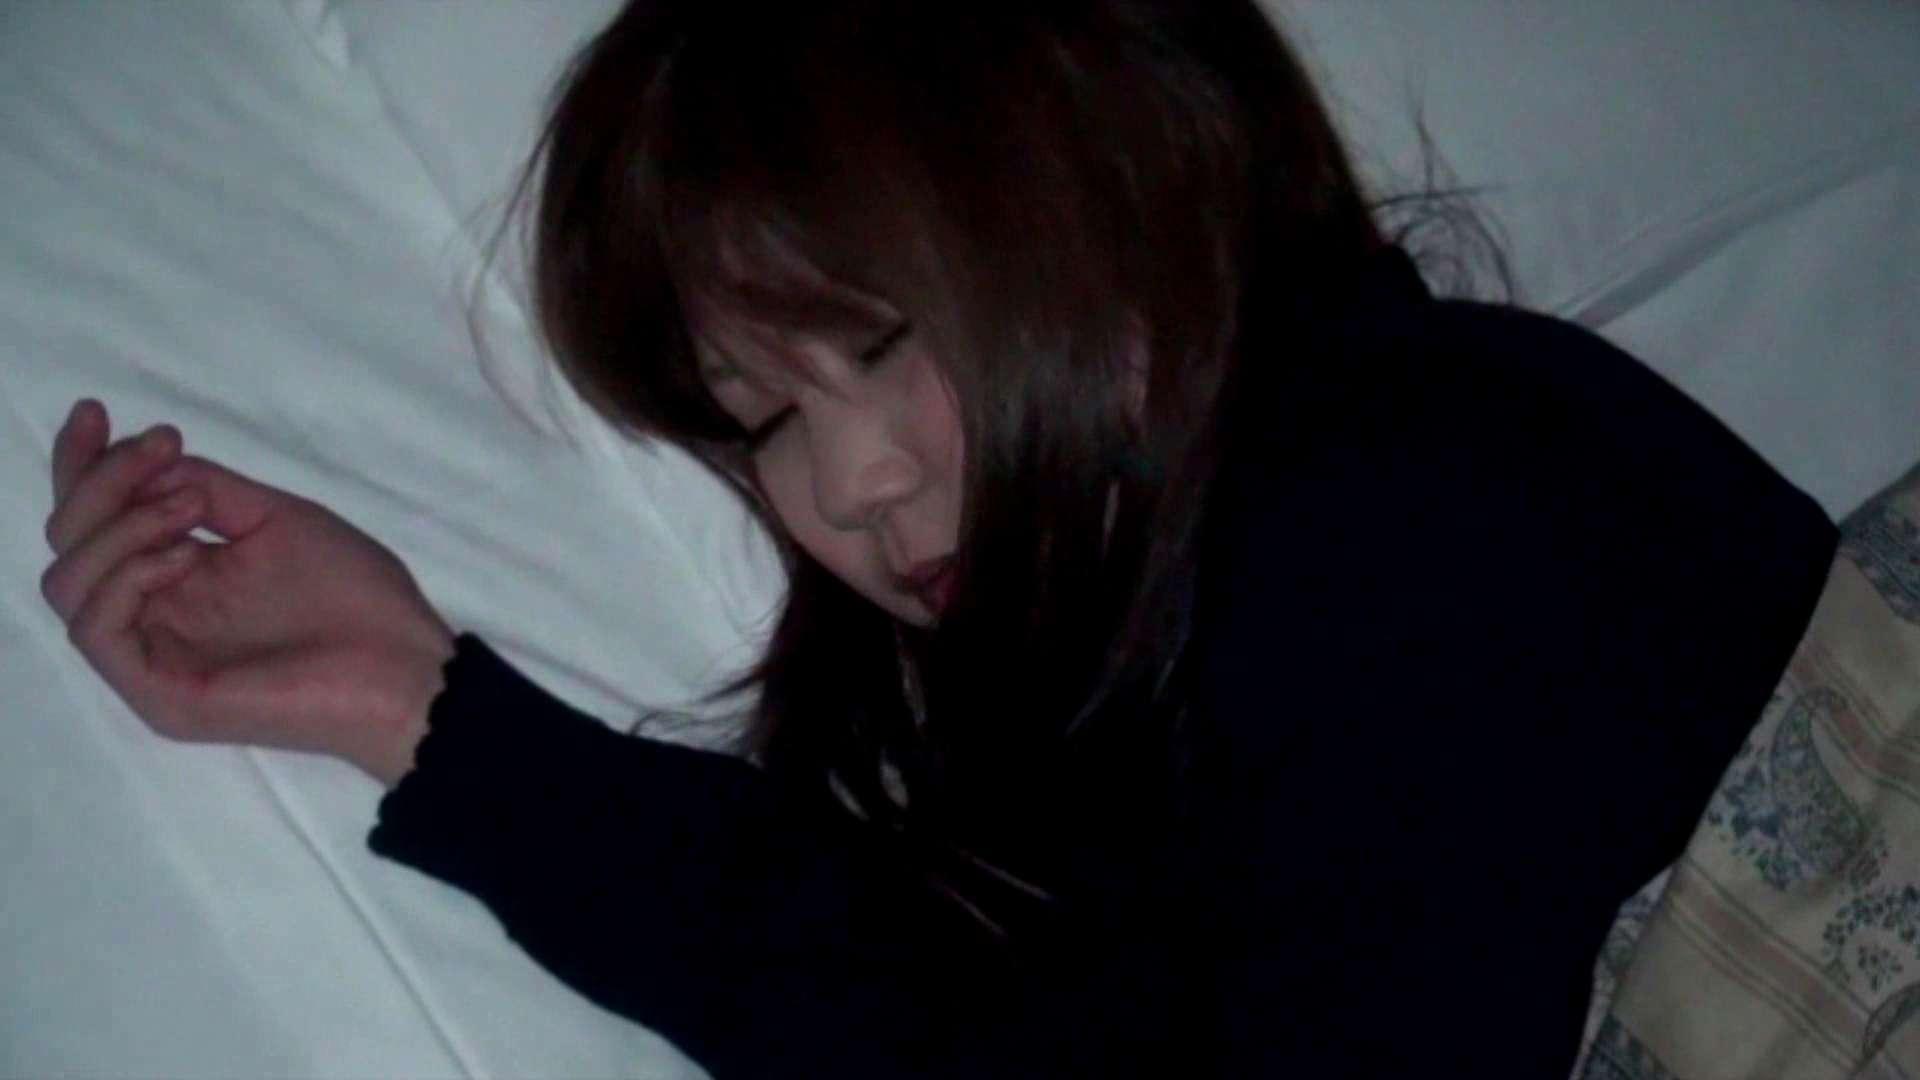 vol.32 【A・Yちゃん】 お嬢様系現役JD 1回目 エッチすぎる友人  27連発 9